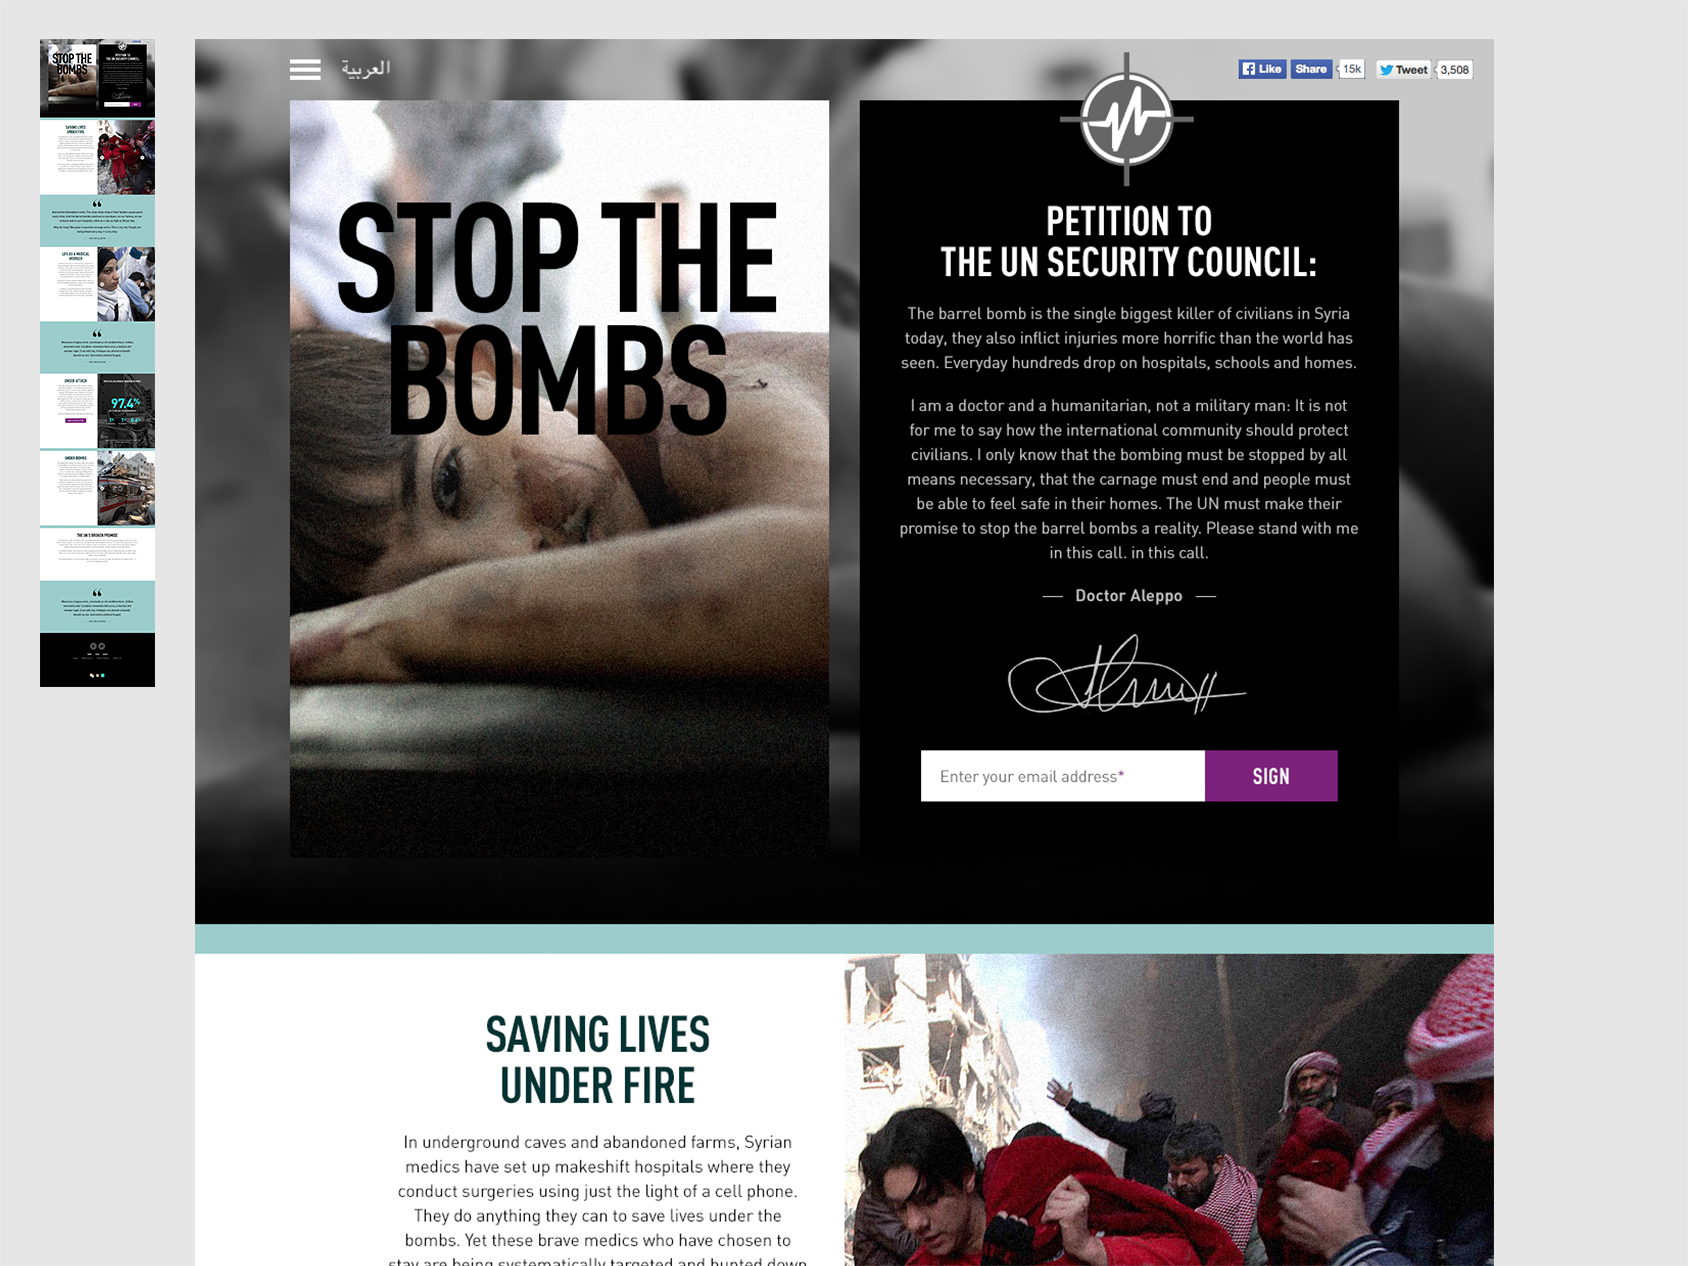 10_syria_bomb_p1@2x.jpg